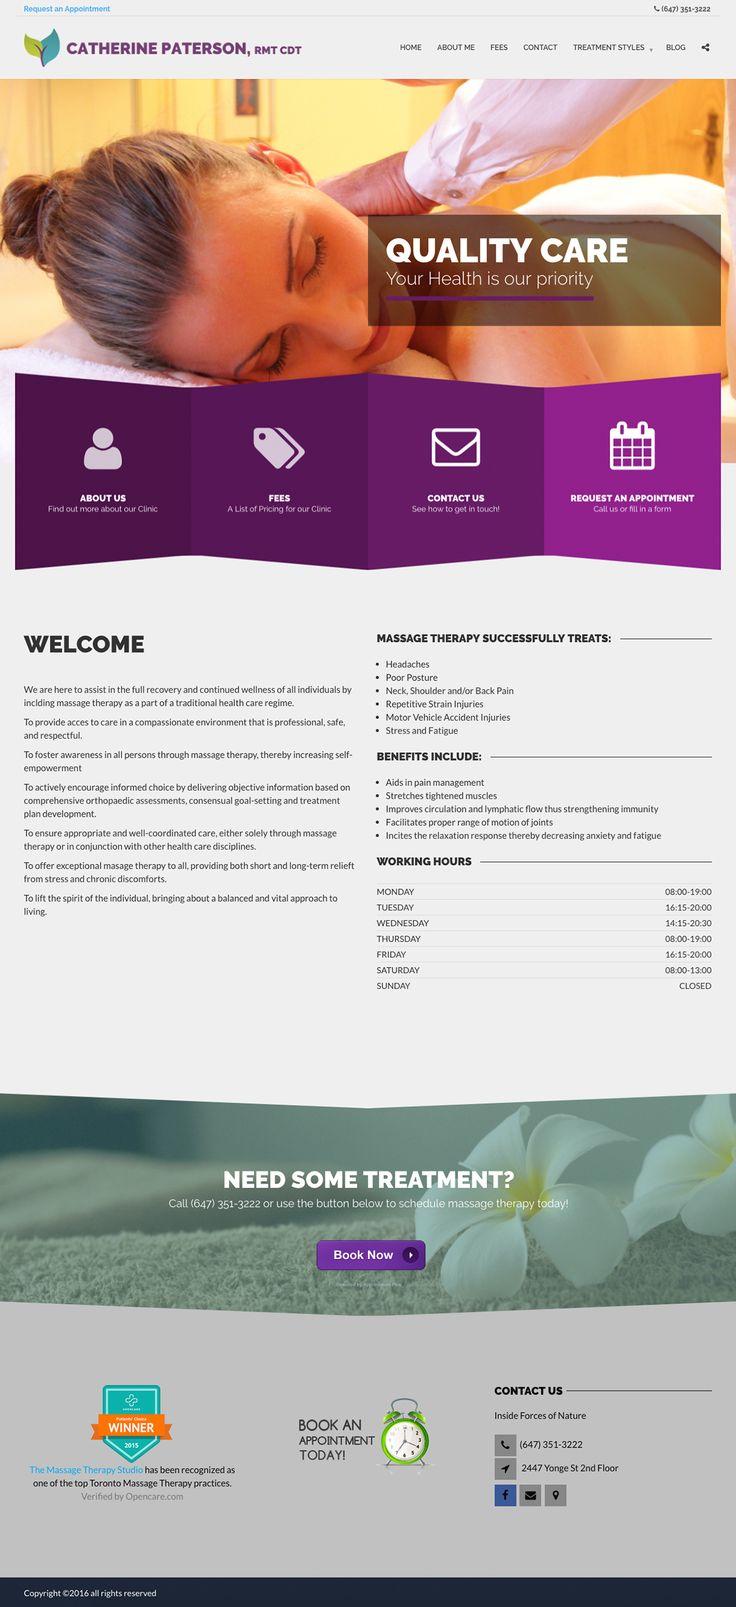 Massage Therapy Studio 102 best Website design